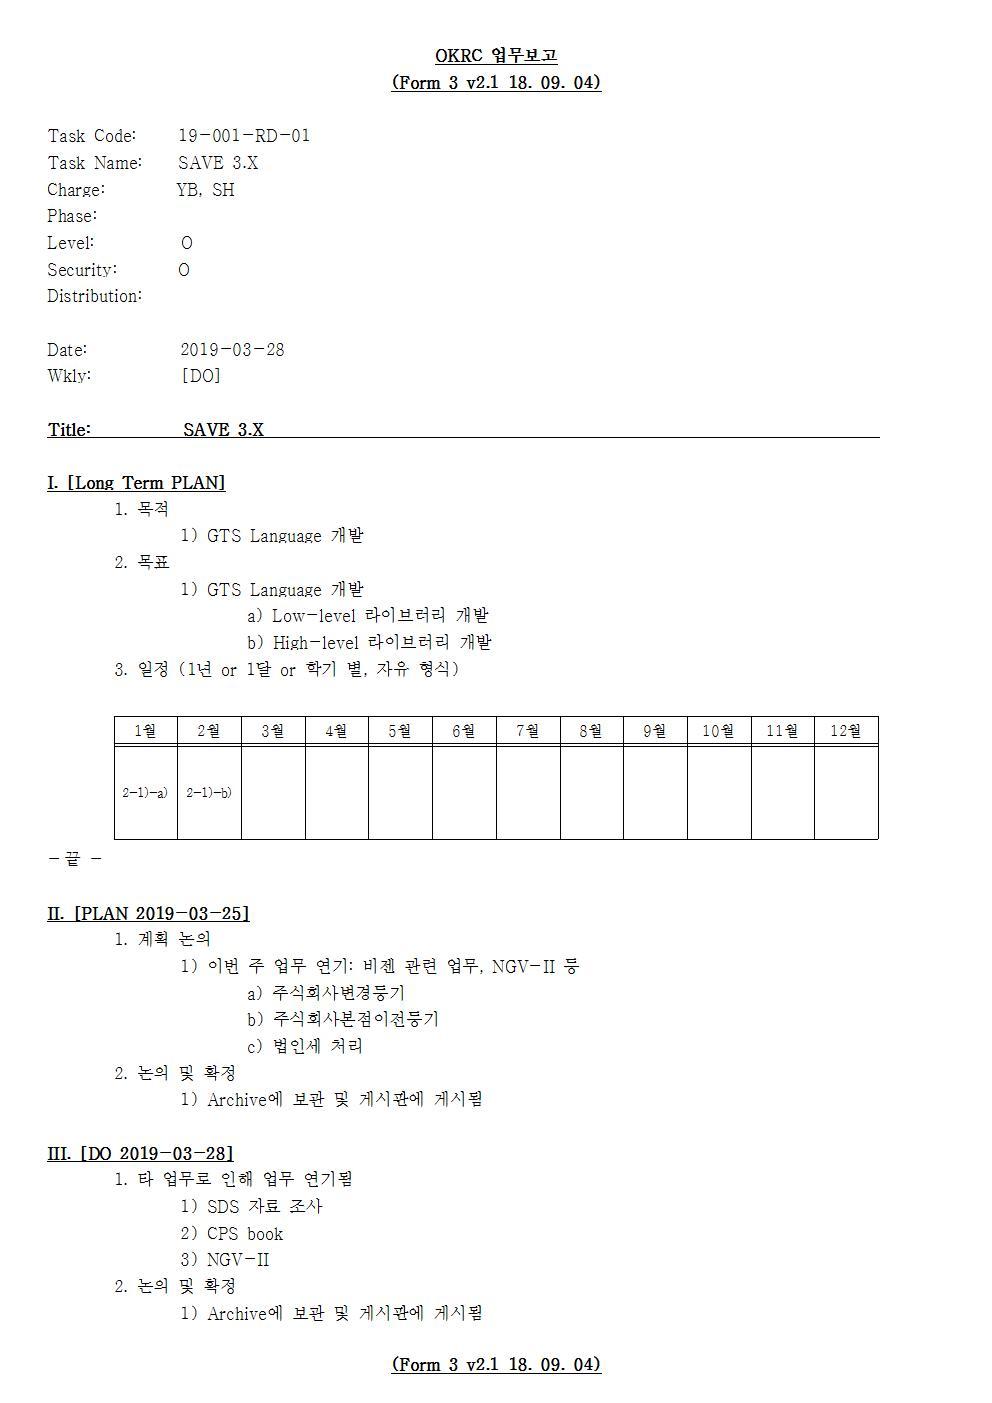 D-[19-001-RD-01]-[SAVE 3.X]-[2019-03-28][SH]001.jpg